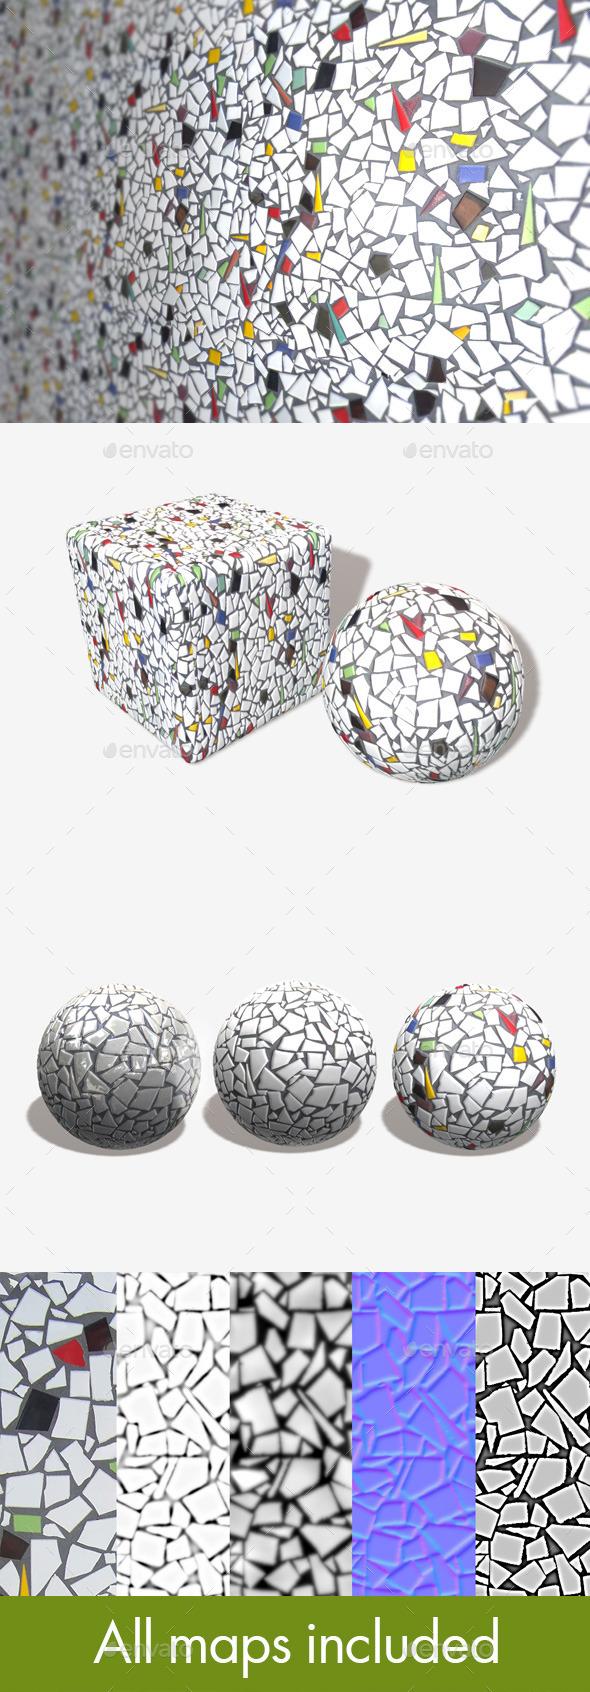 Mosaic Tiles Seamless Texture - 3DOcean Item for Sale